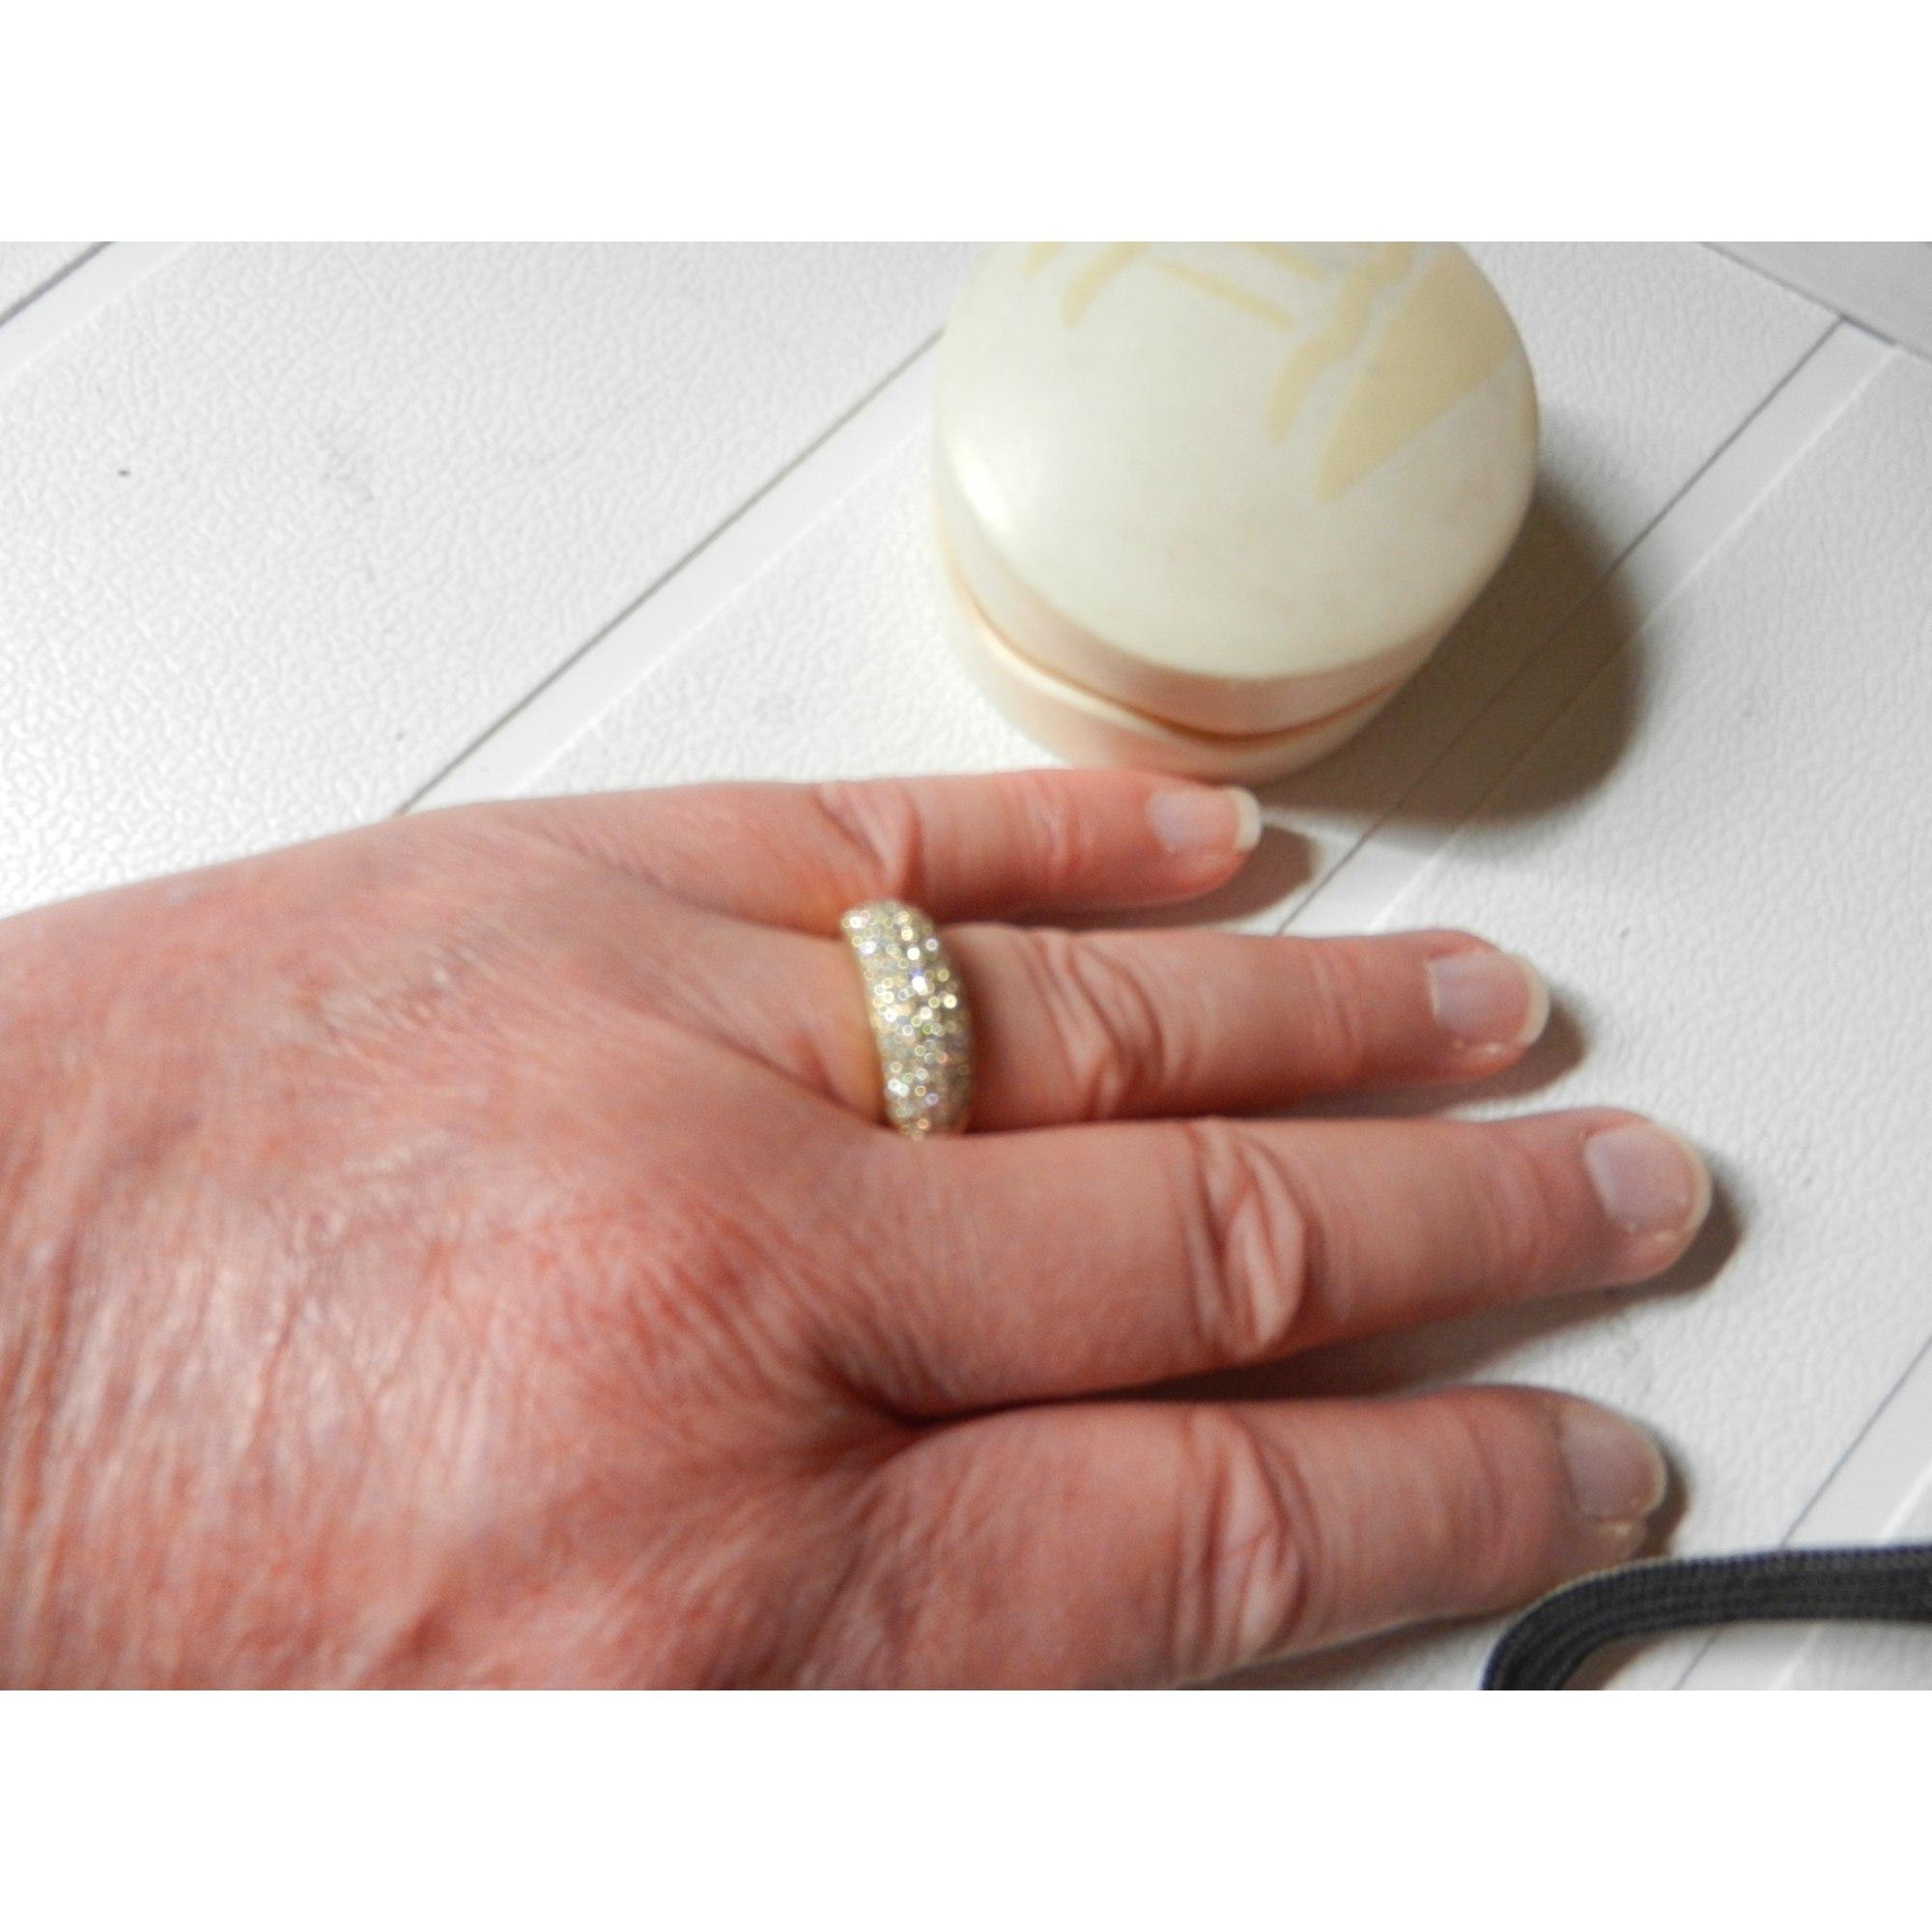 manege a bijoux bague or